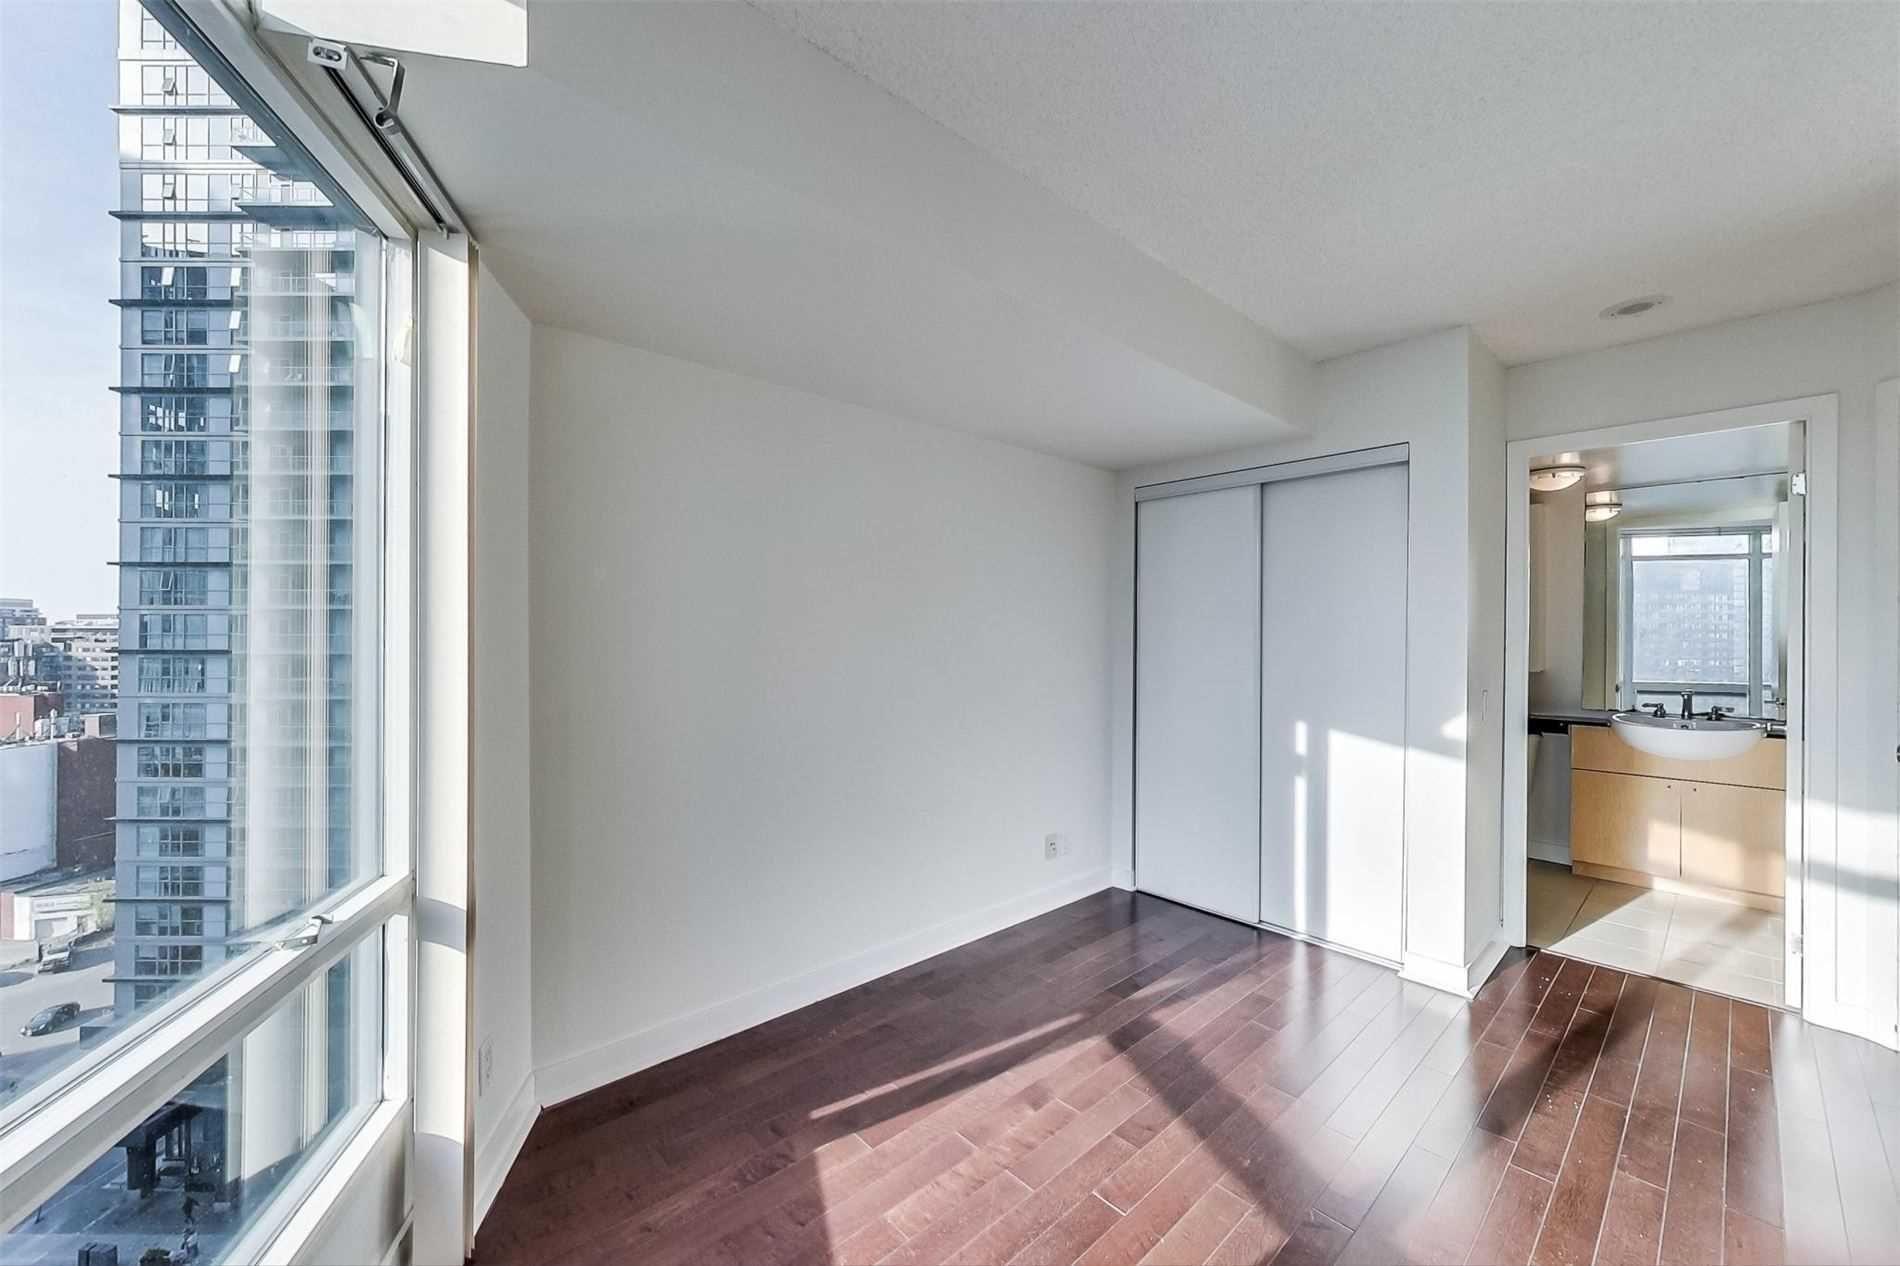 Photo 12: Photos: 1708 361 W Front Street in Toronto: Waterfront Communities C1 Condo for lease (Toronto C01)  : MLS®# C5087813